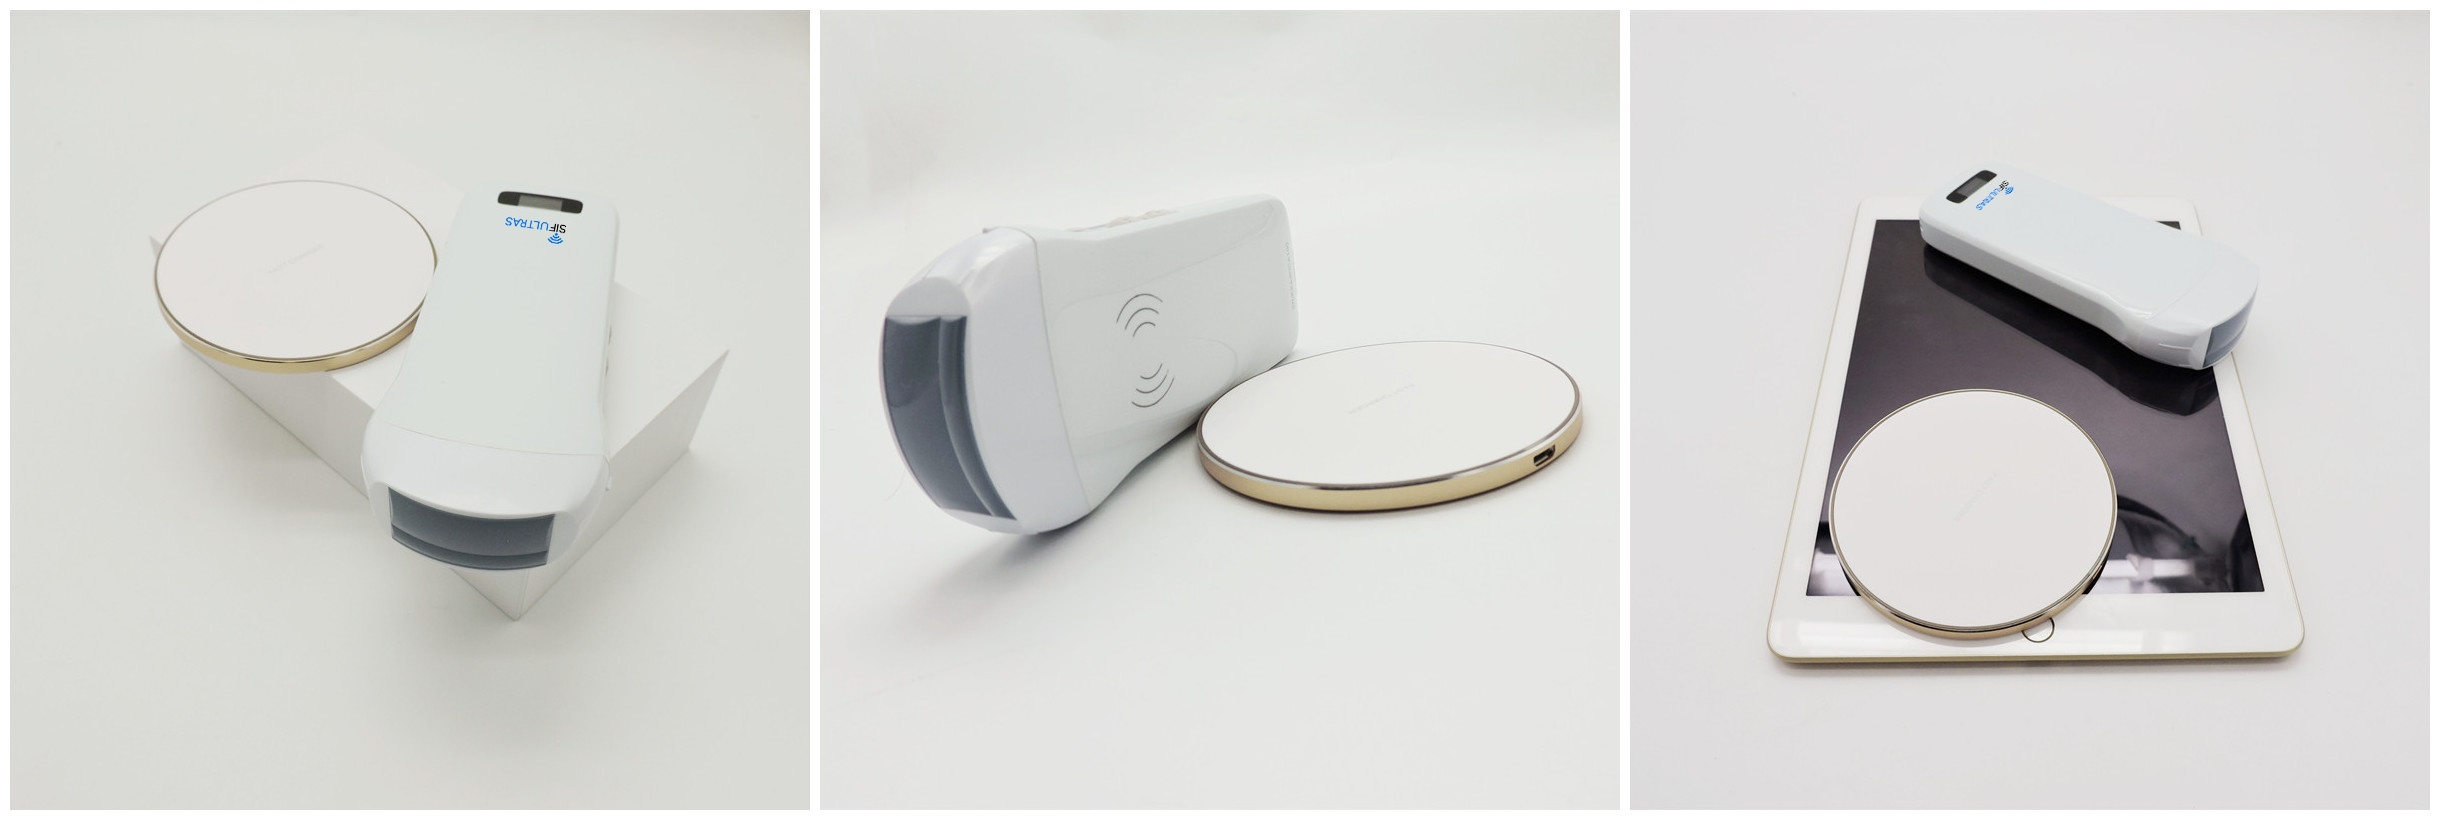 Wireless 3 in 1 Ultrasound Scanner SIFULTRAS-3.3 Triple Headed: Convex, Linear and Cardiac Probe  Ultrasound Scanner